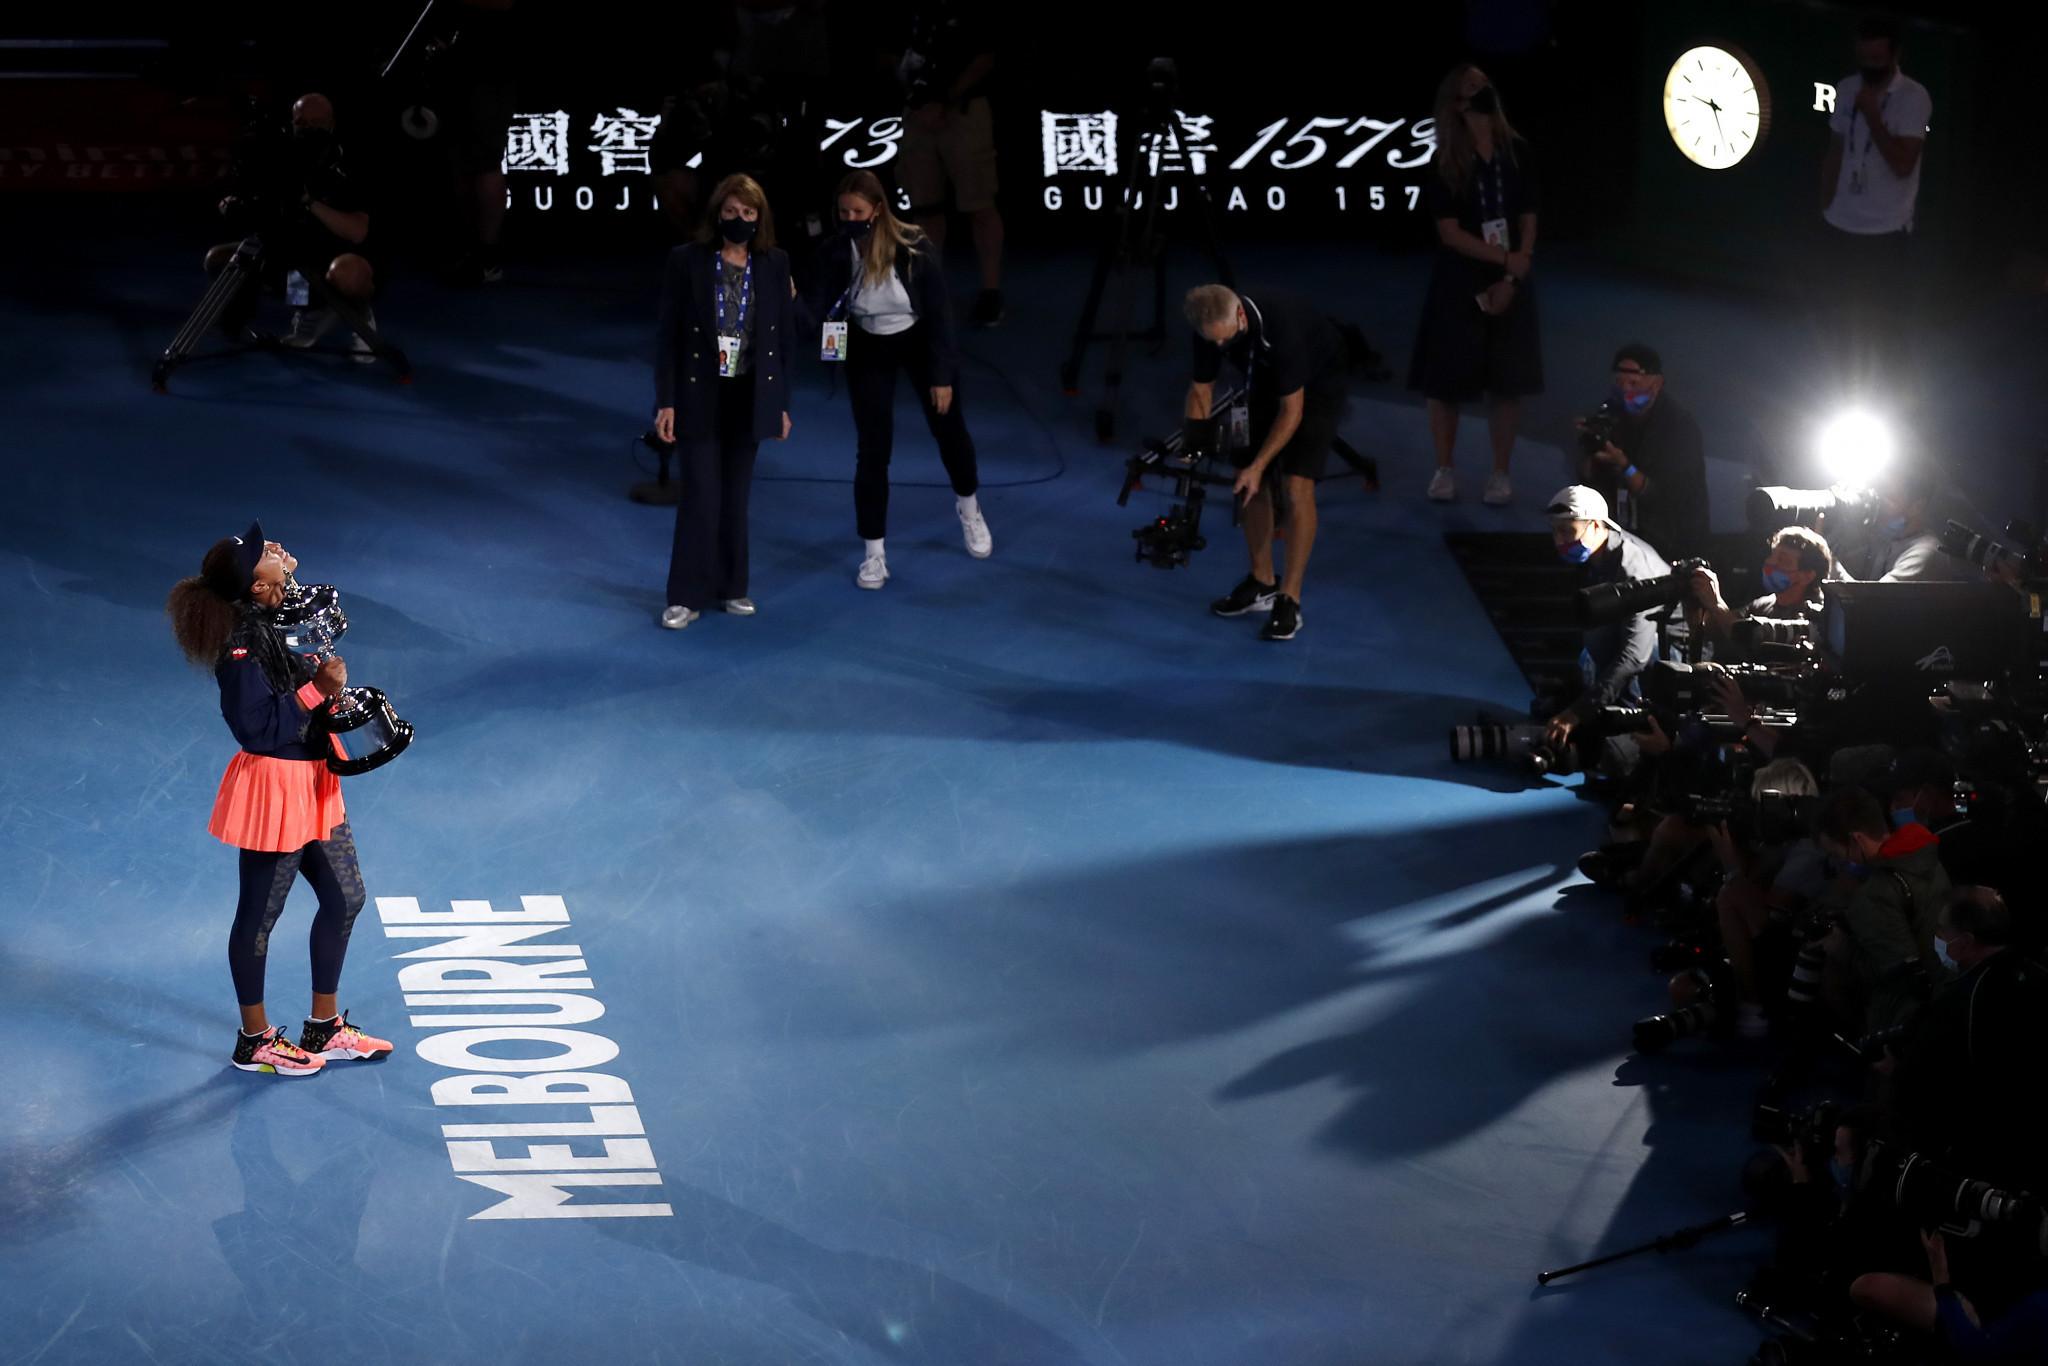 Naomi Osaka has won the last two Grand Slam tournaments ©Getty Images